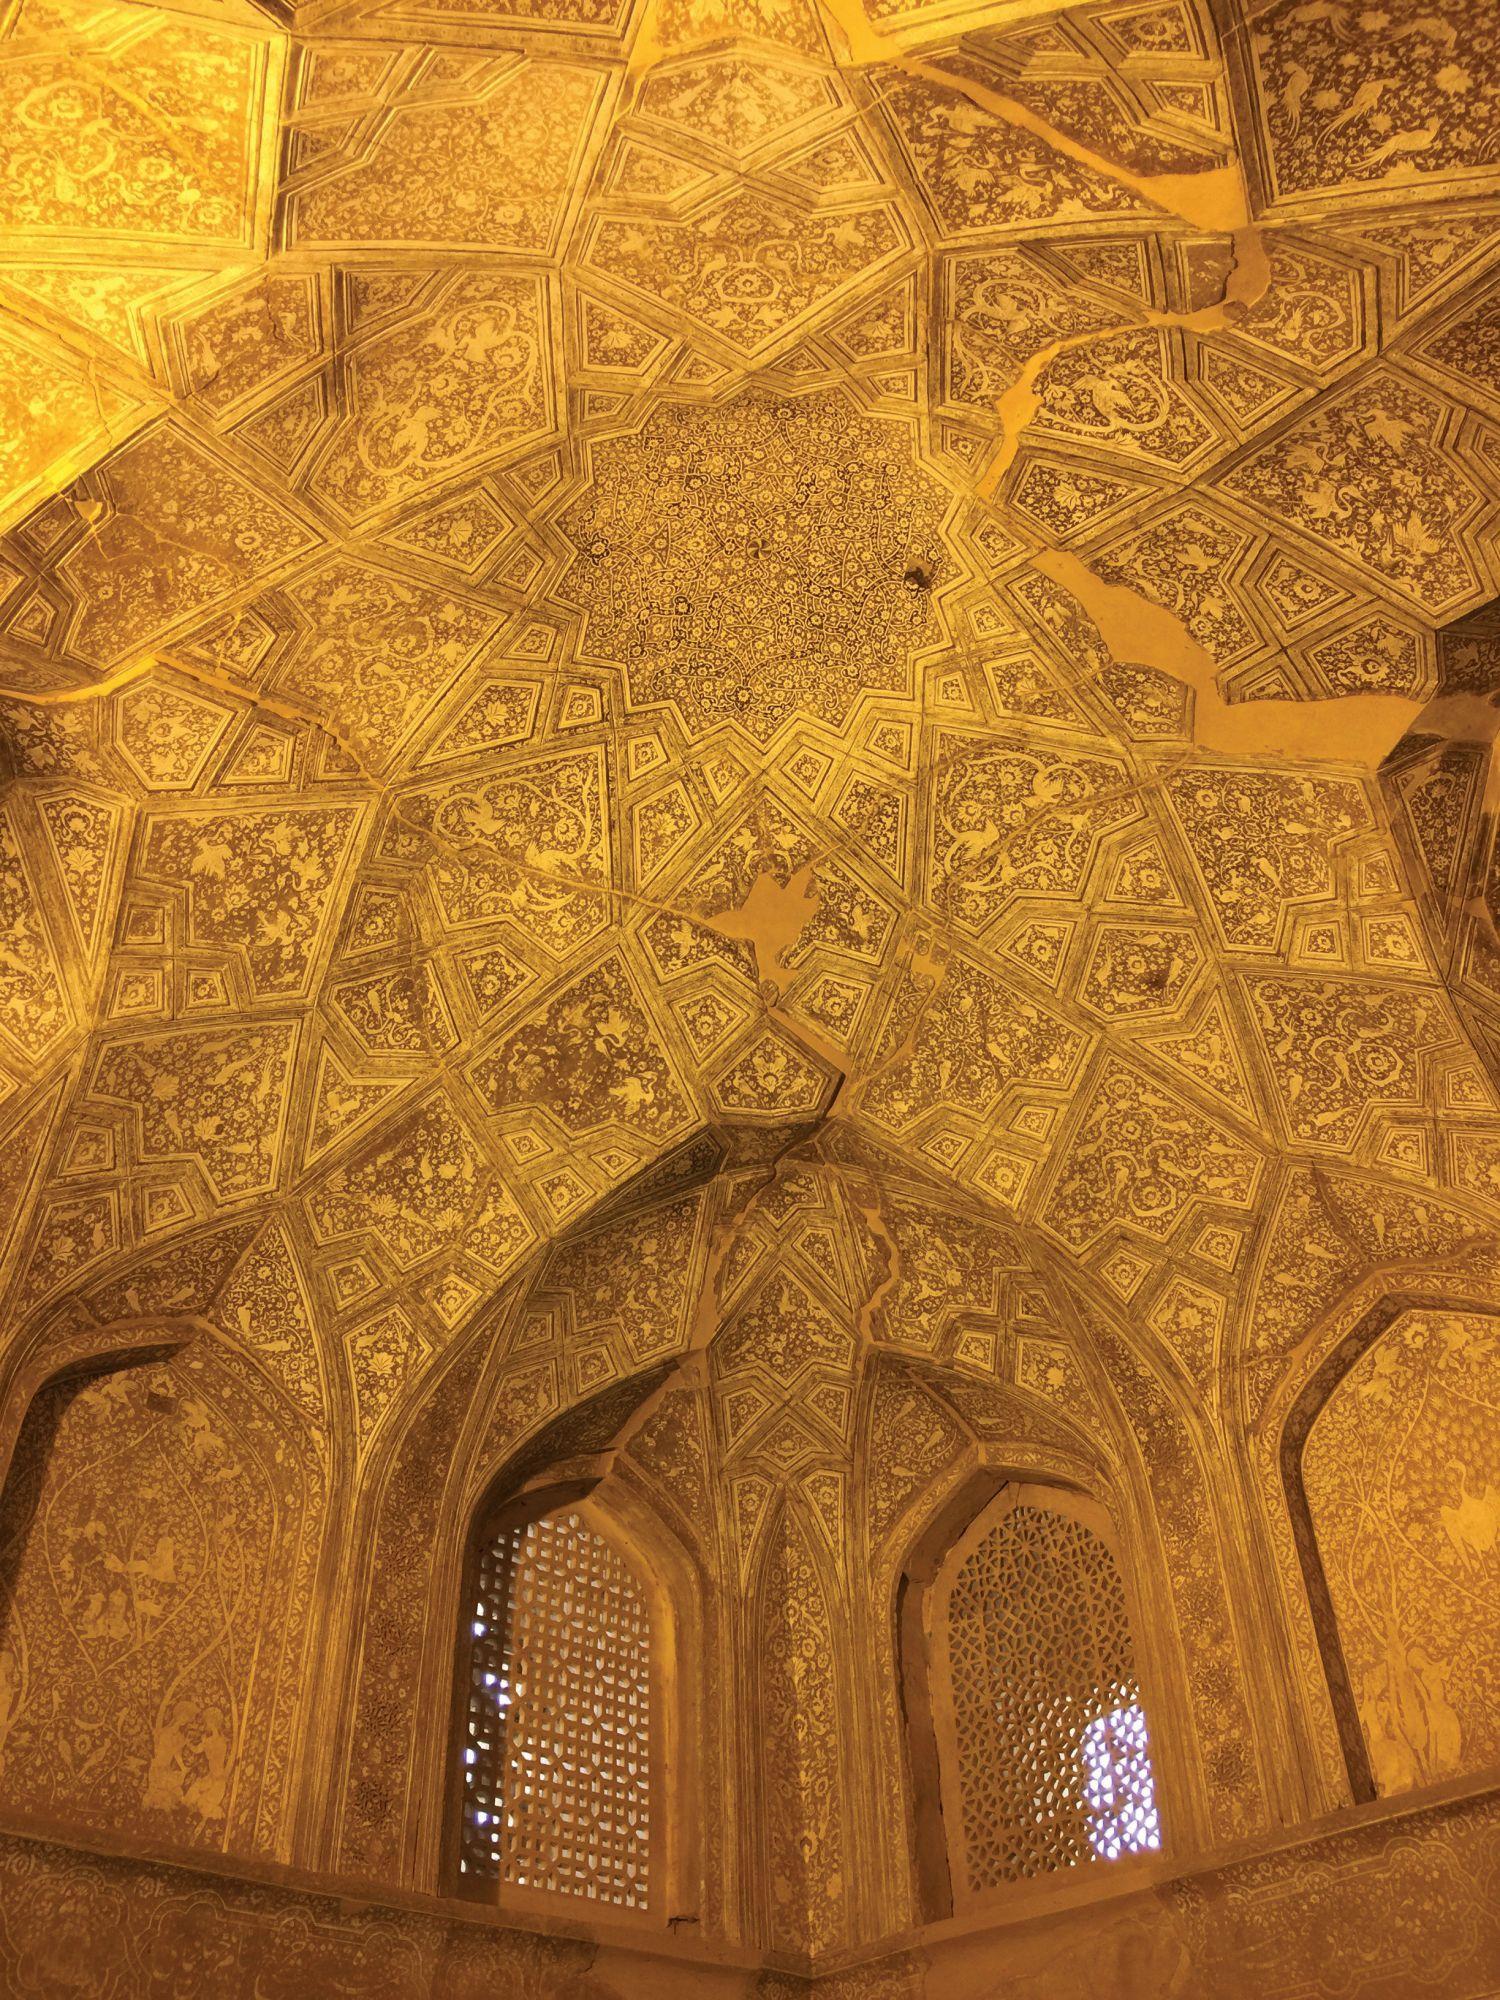 Iran: A Kaleidoscope of Memories